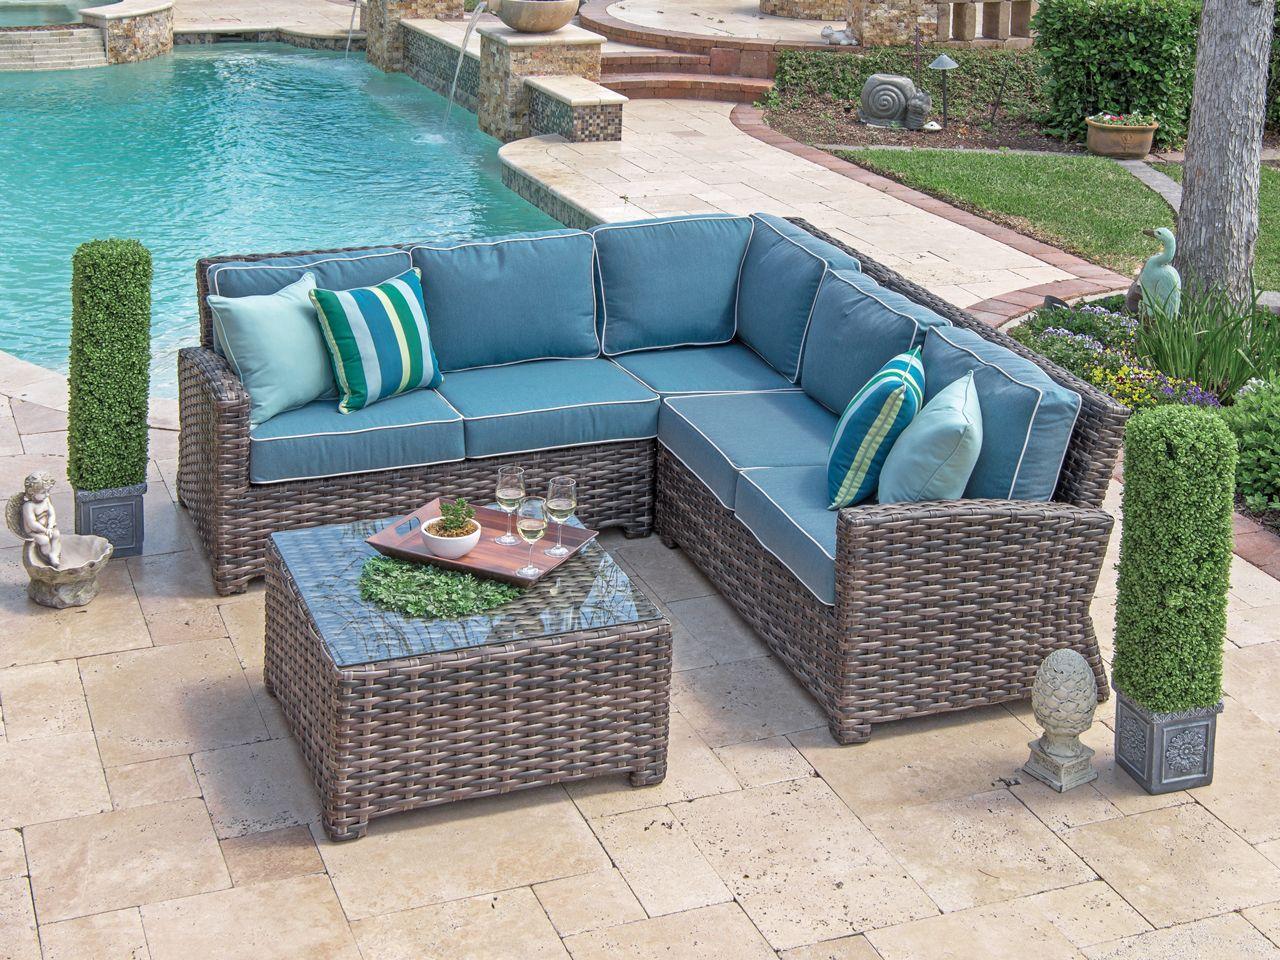 Chair King Backyard Store Wicker Sofa Outdoor Outdoor Wicker Outdoor Furniture